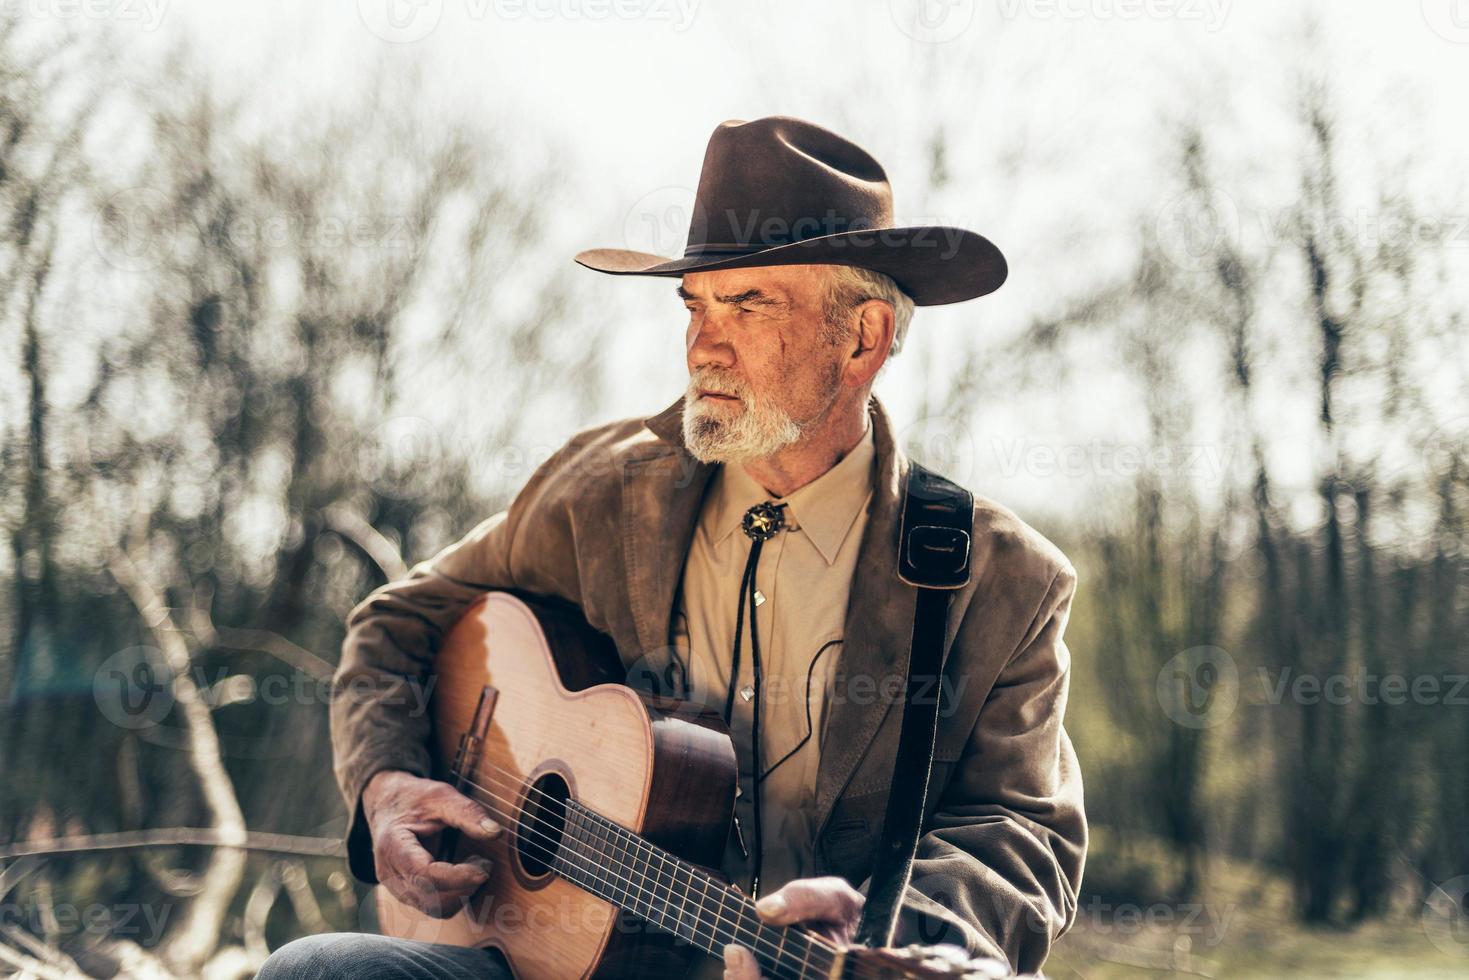 pays solitaire et musicien occidental photo